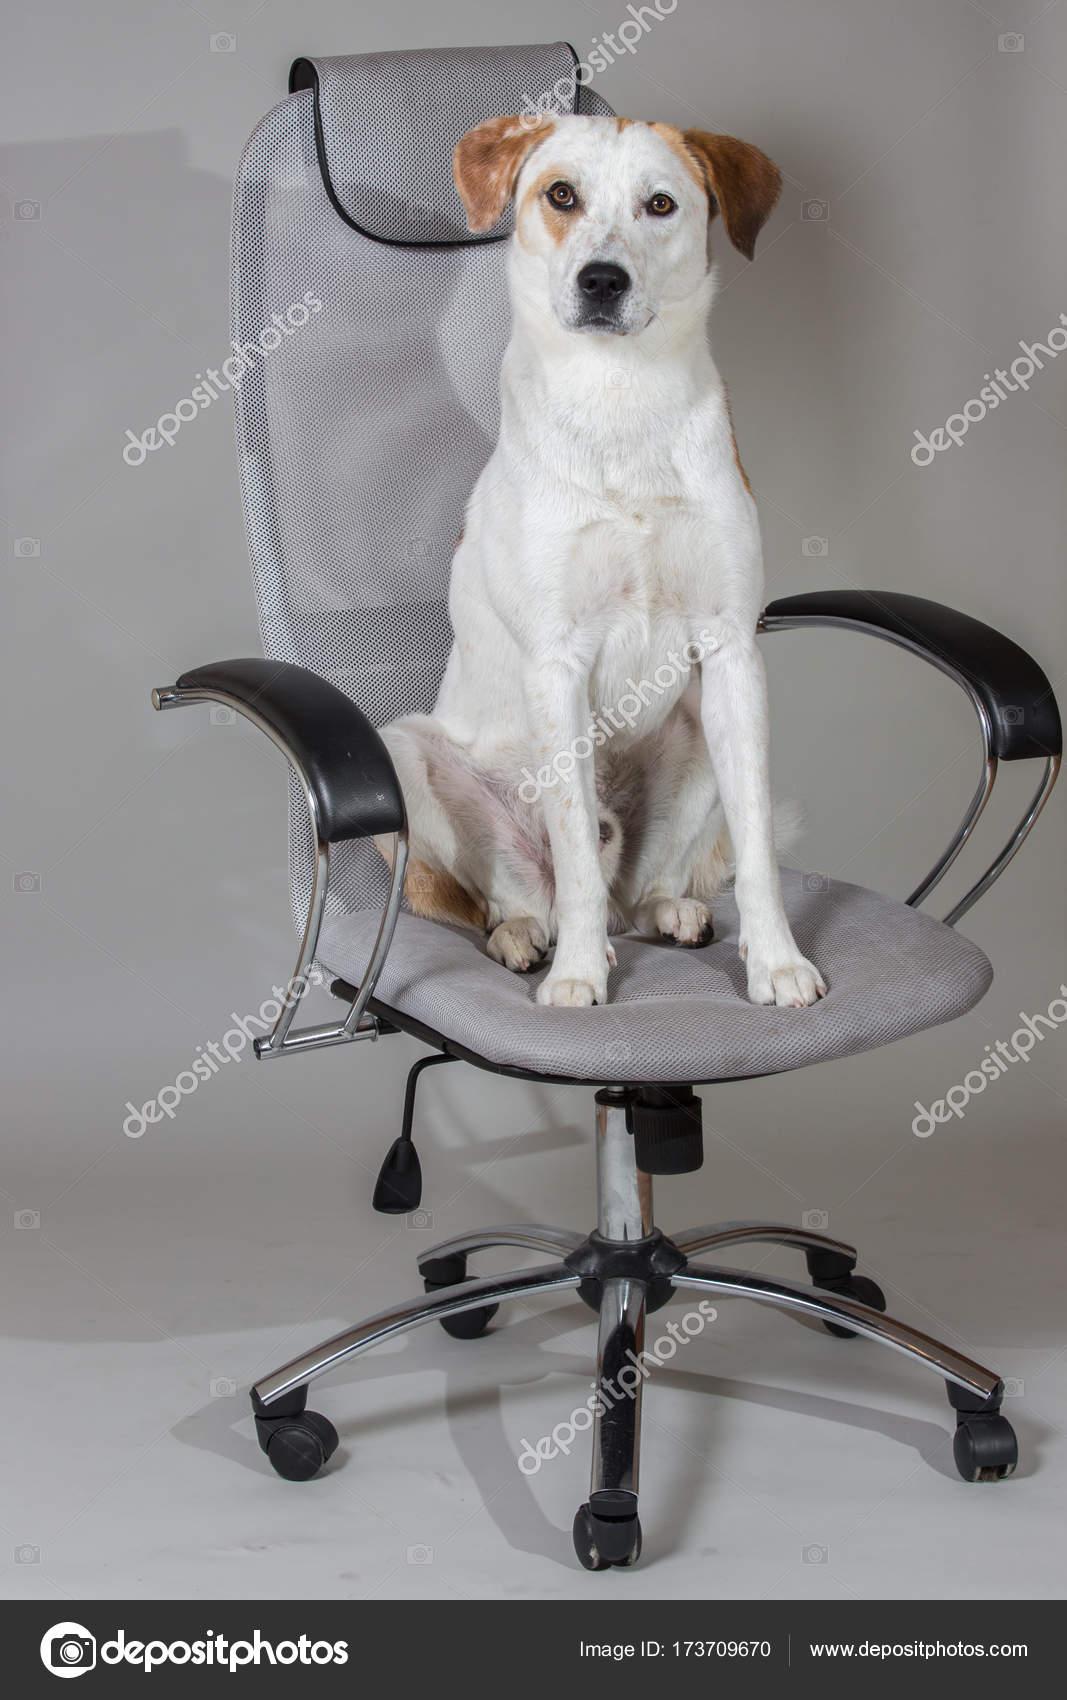 Pelo Corto De Raza Mixta Perro Blanco Sentado En La Silla